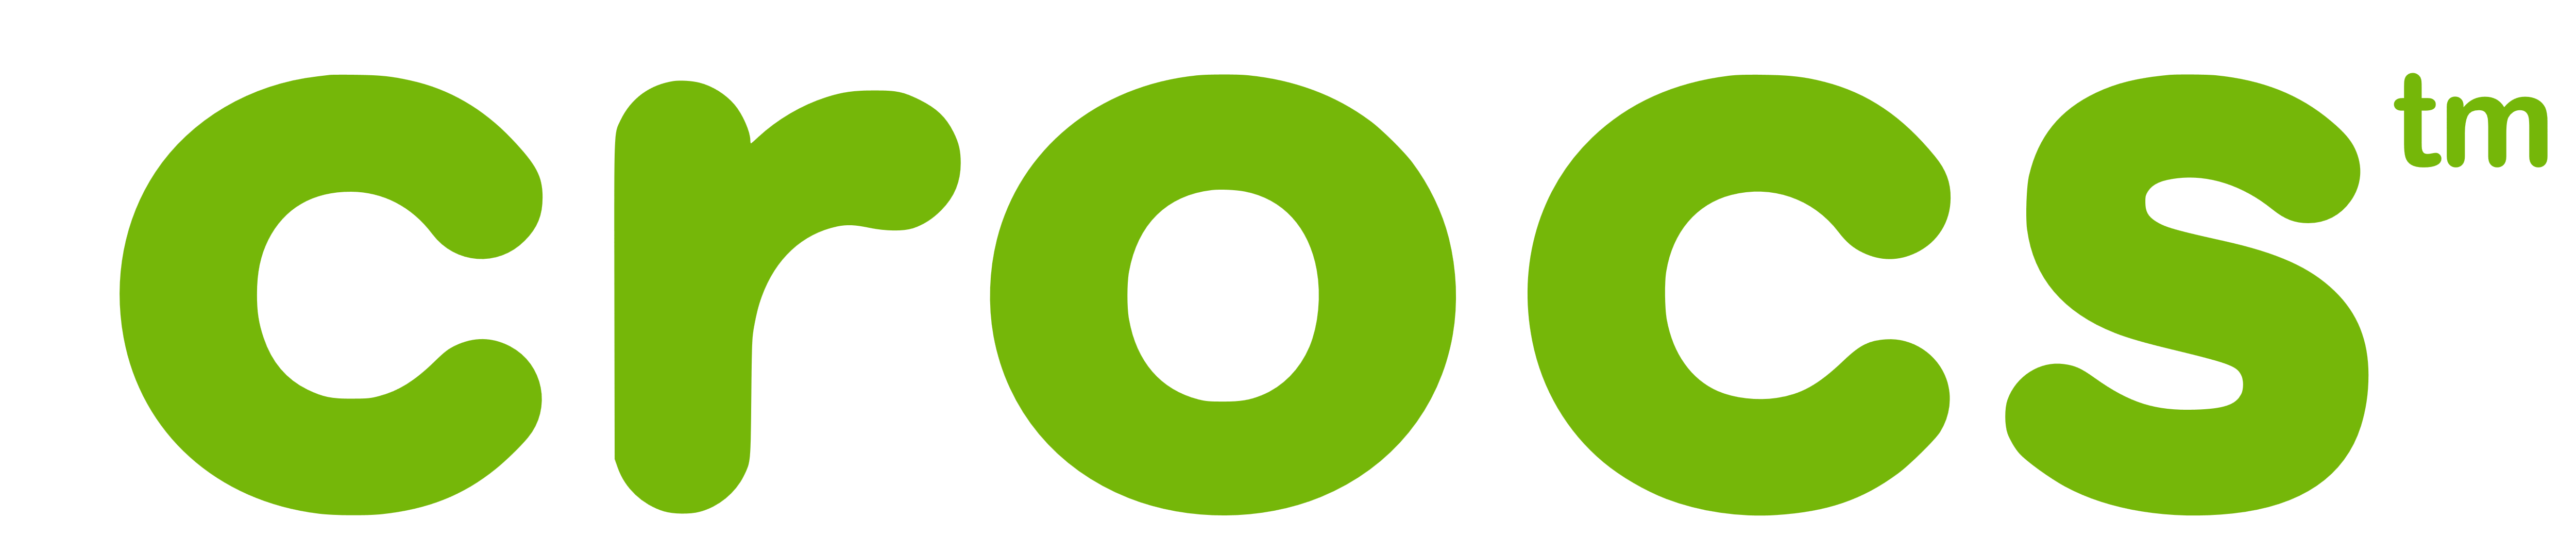 crocs logos download bear vector silhouette bear vector image